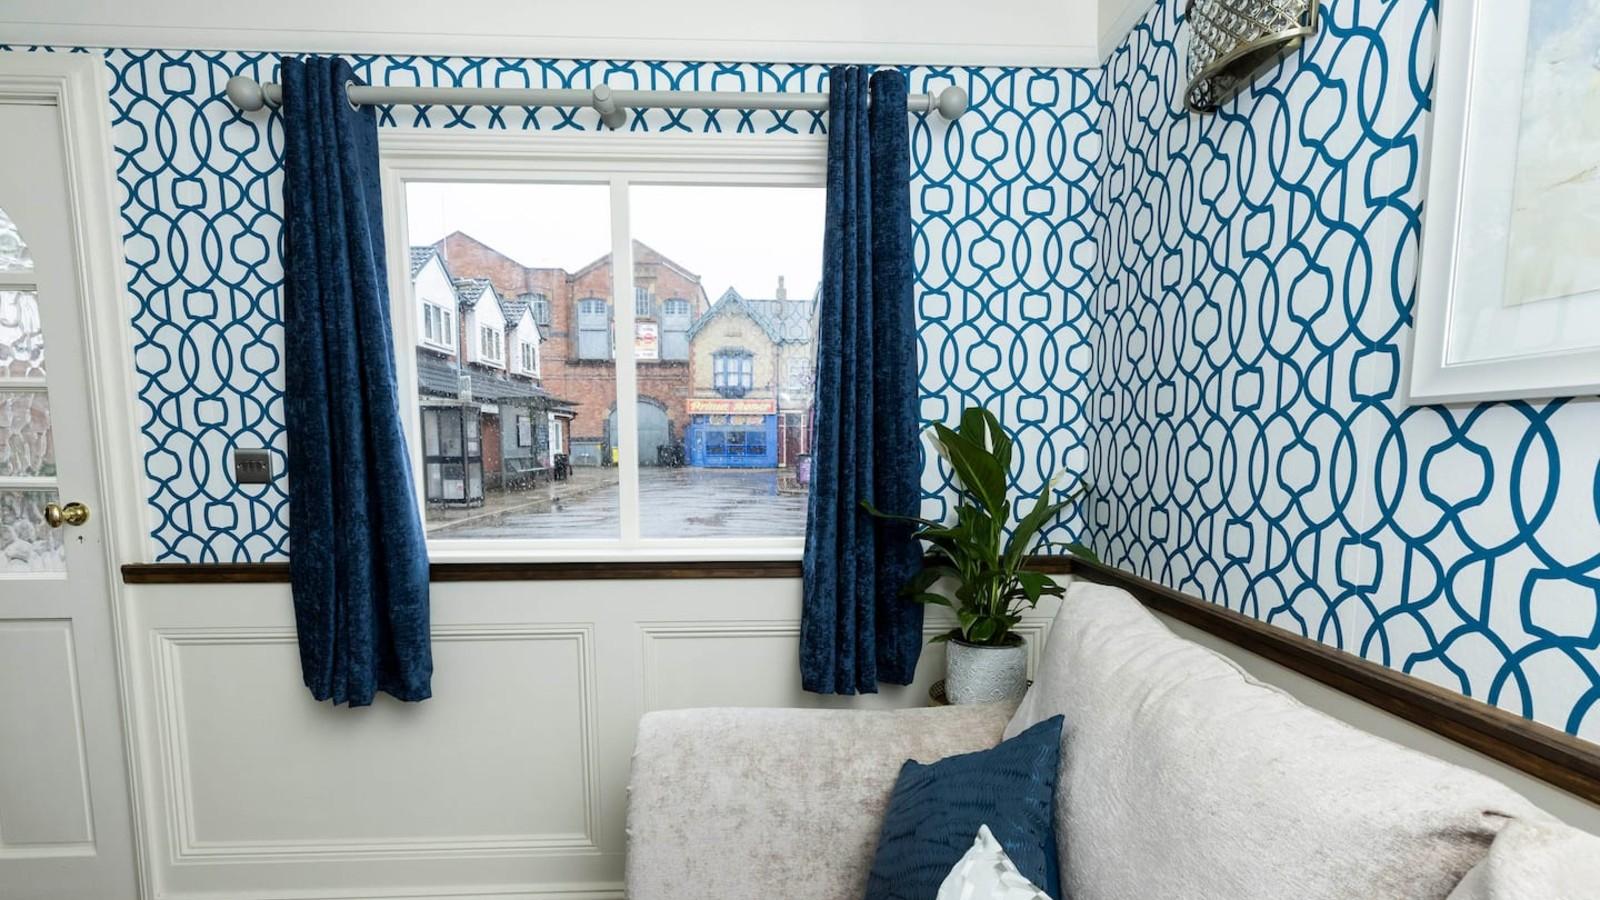 Coronation Street Airbnb, Rovers' Annexe, Coronation Street Airbnb